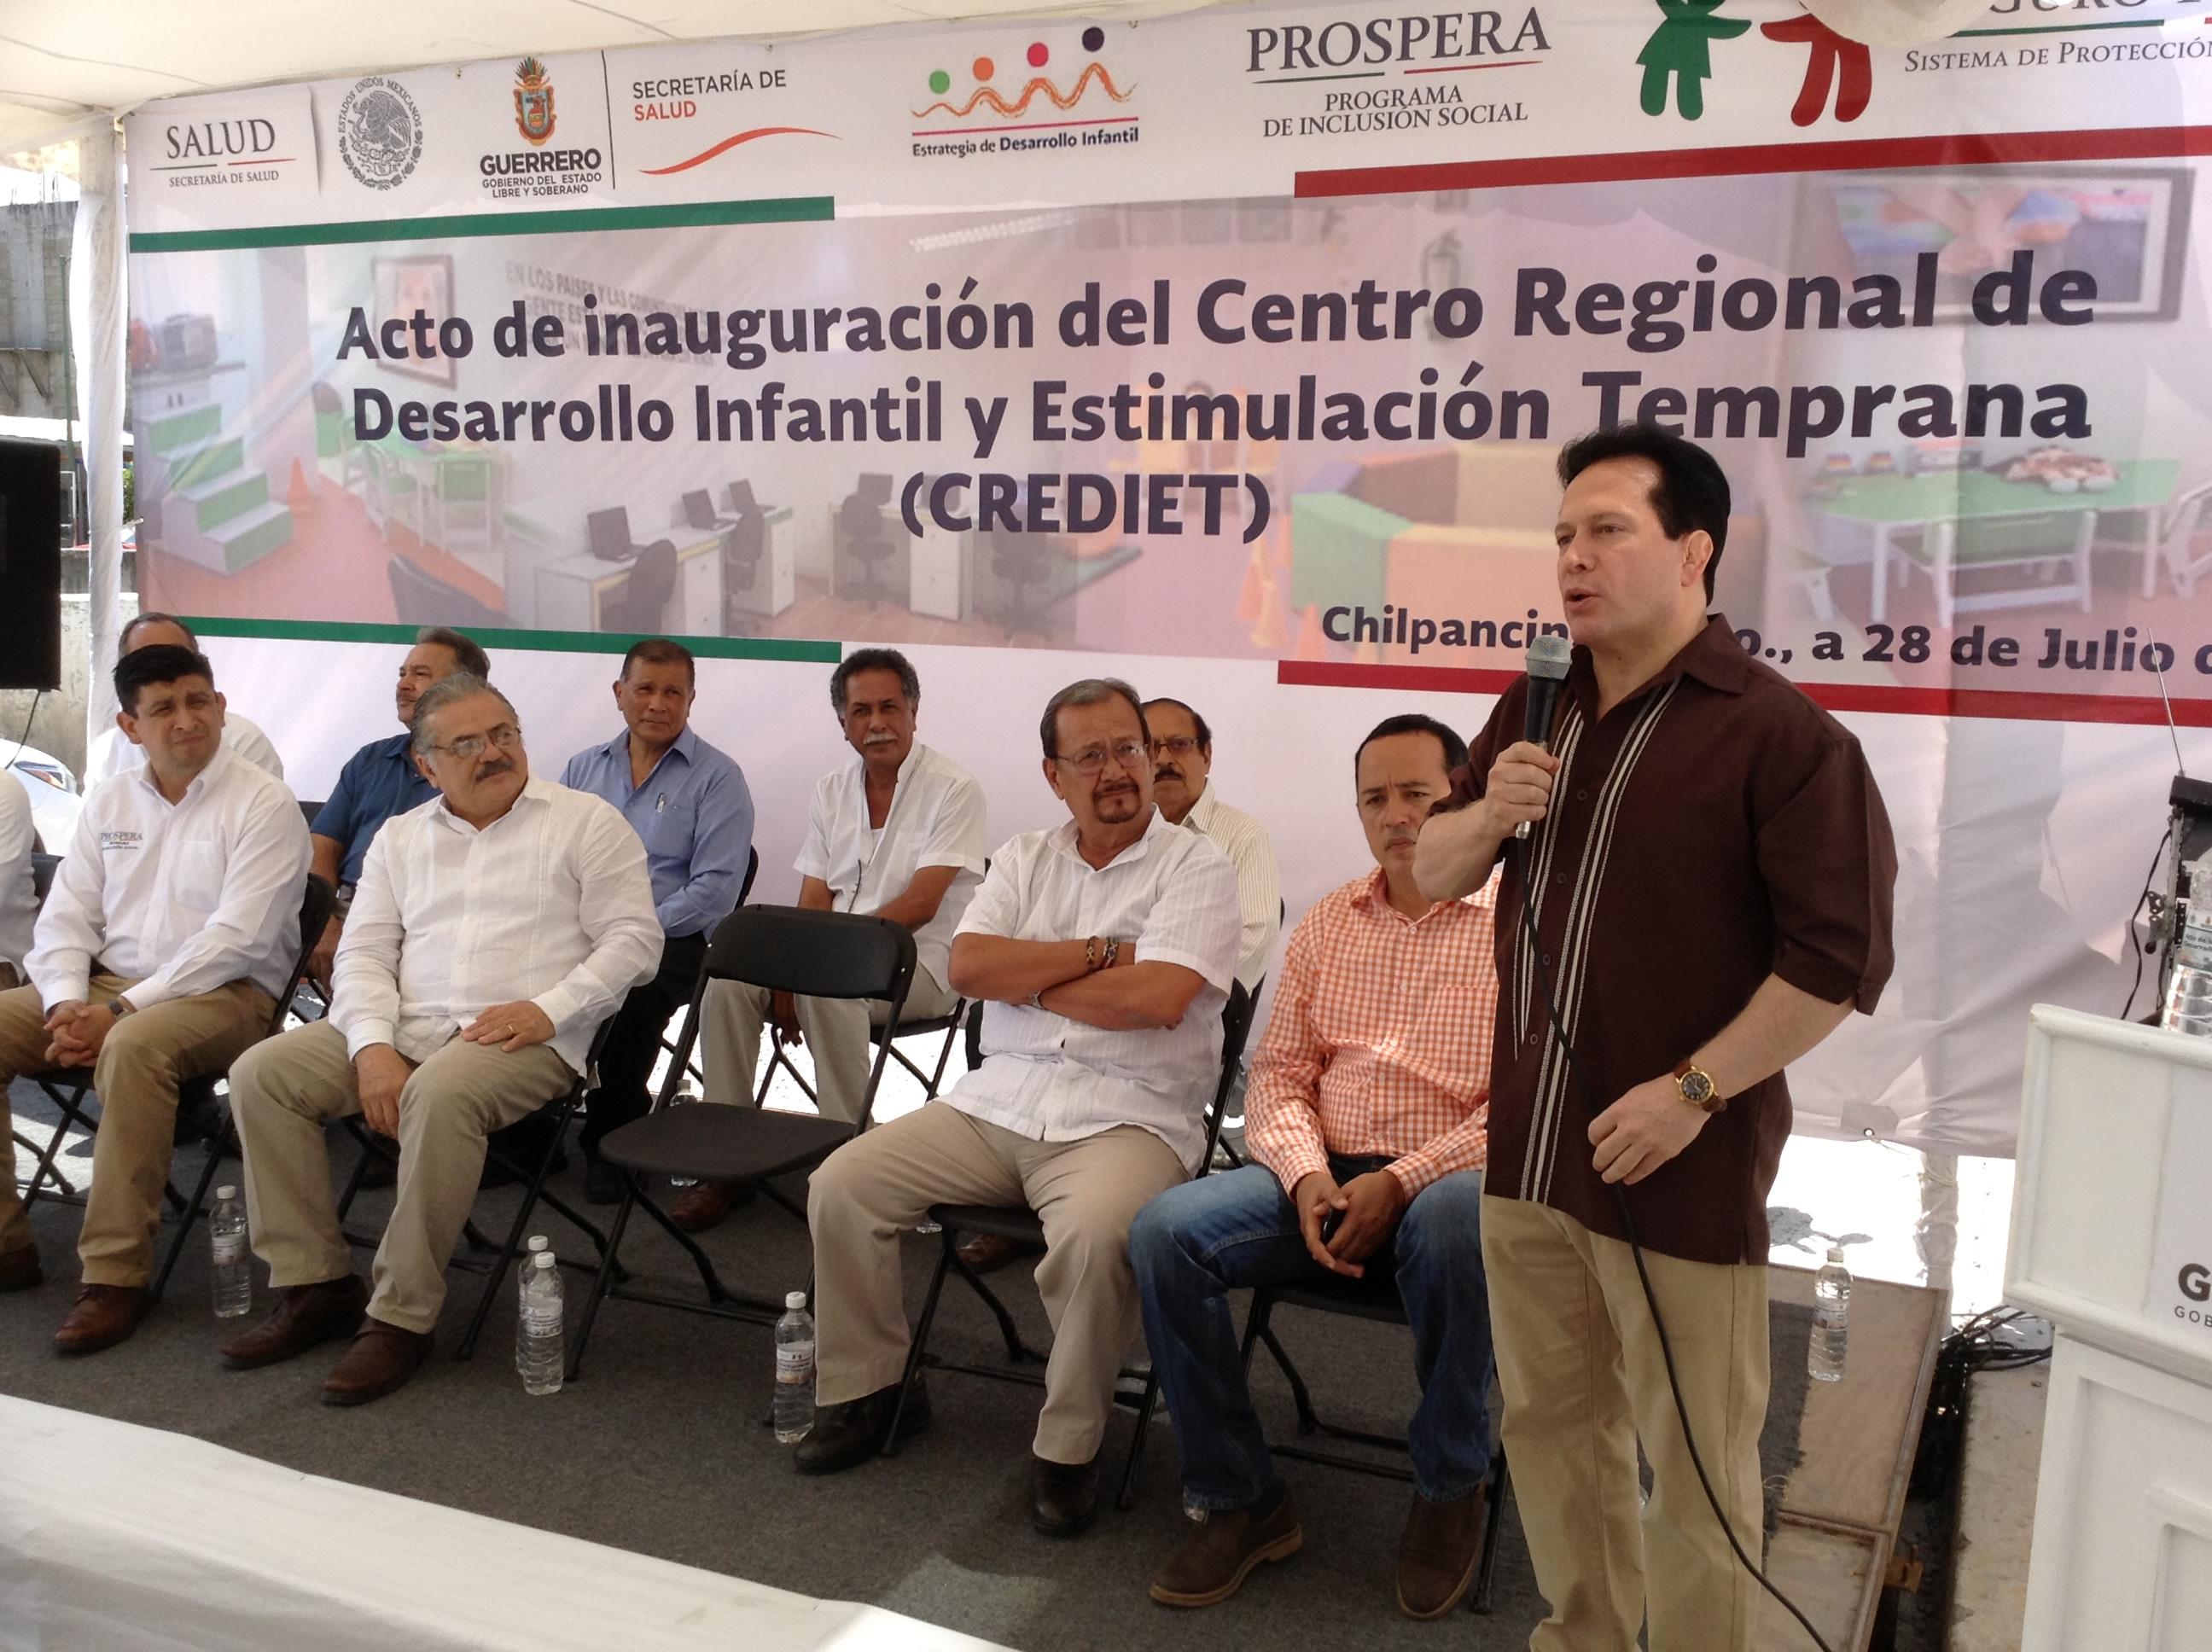 Chilpancingo 1.jpg